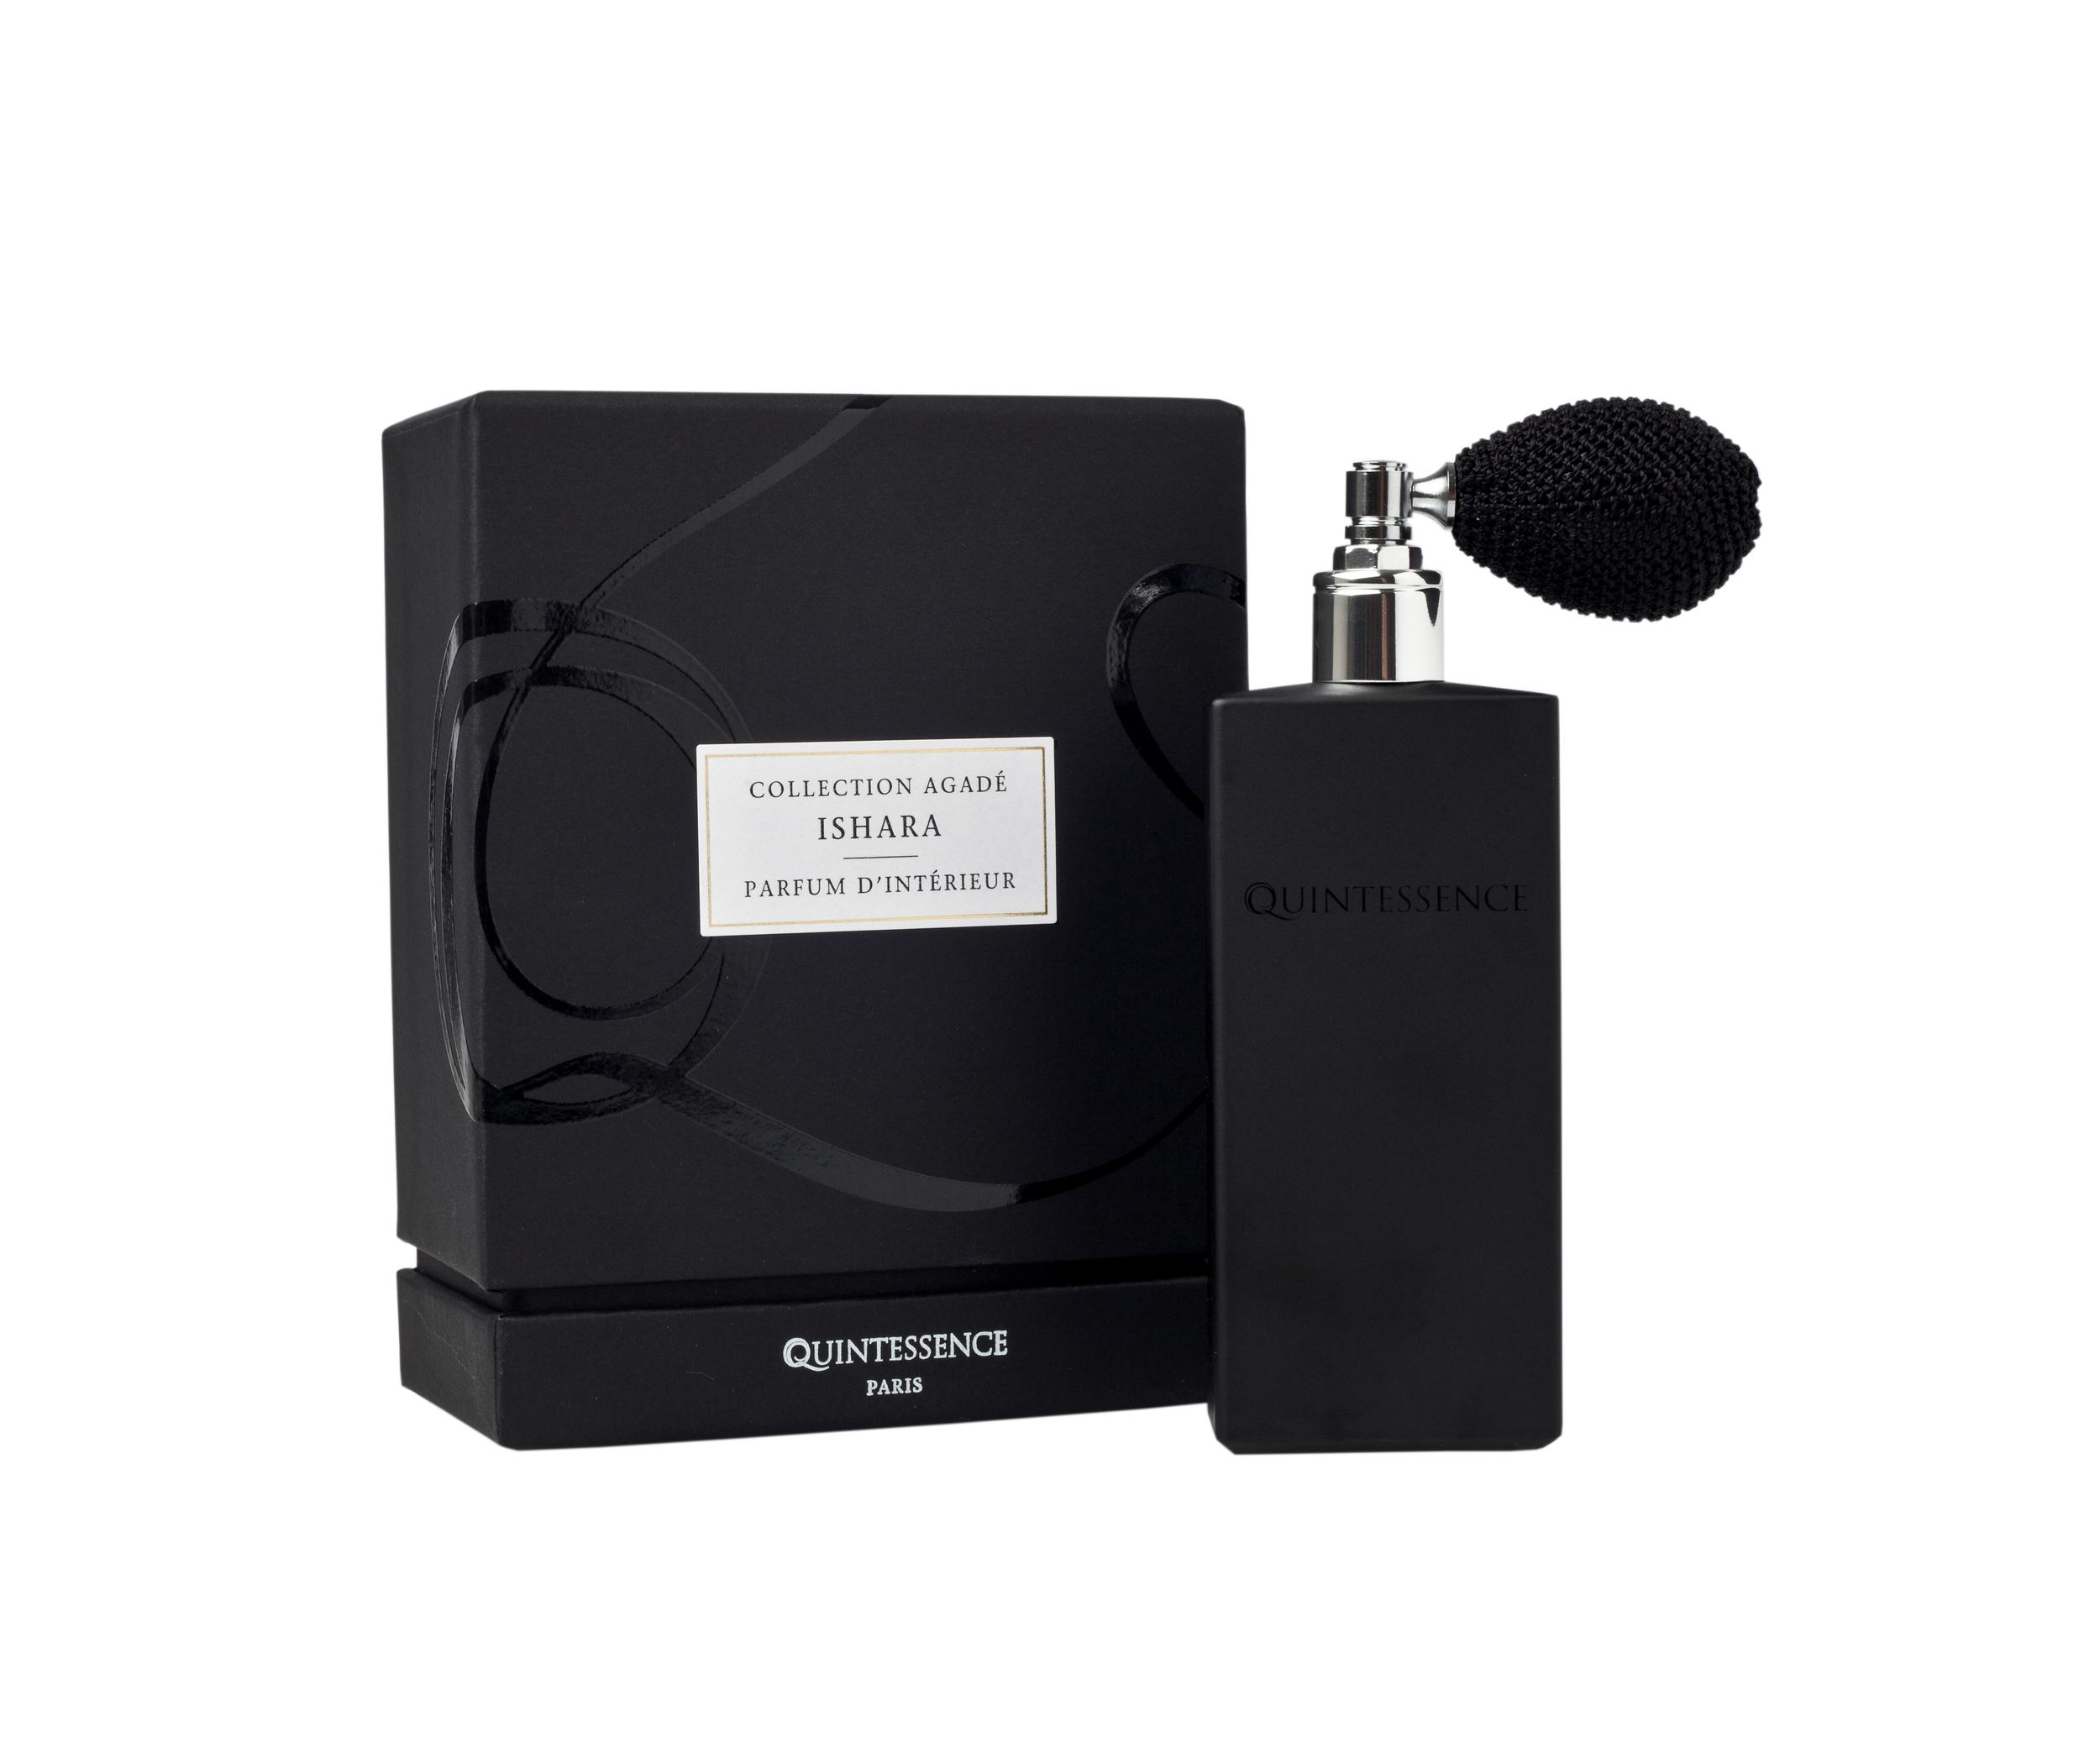 Quintessence-Paris Room Spray. $95